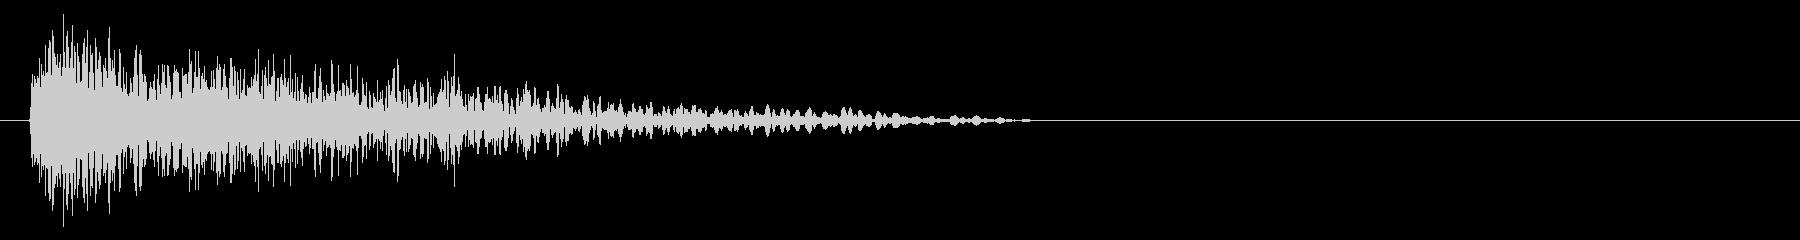 DJ スクラッチ 下降音 デューン↓の未再生の波形